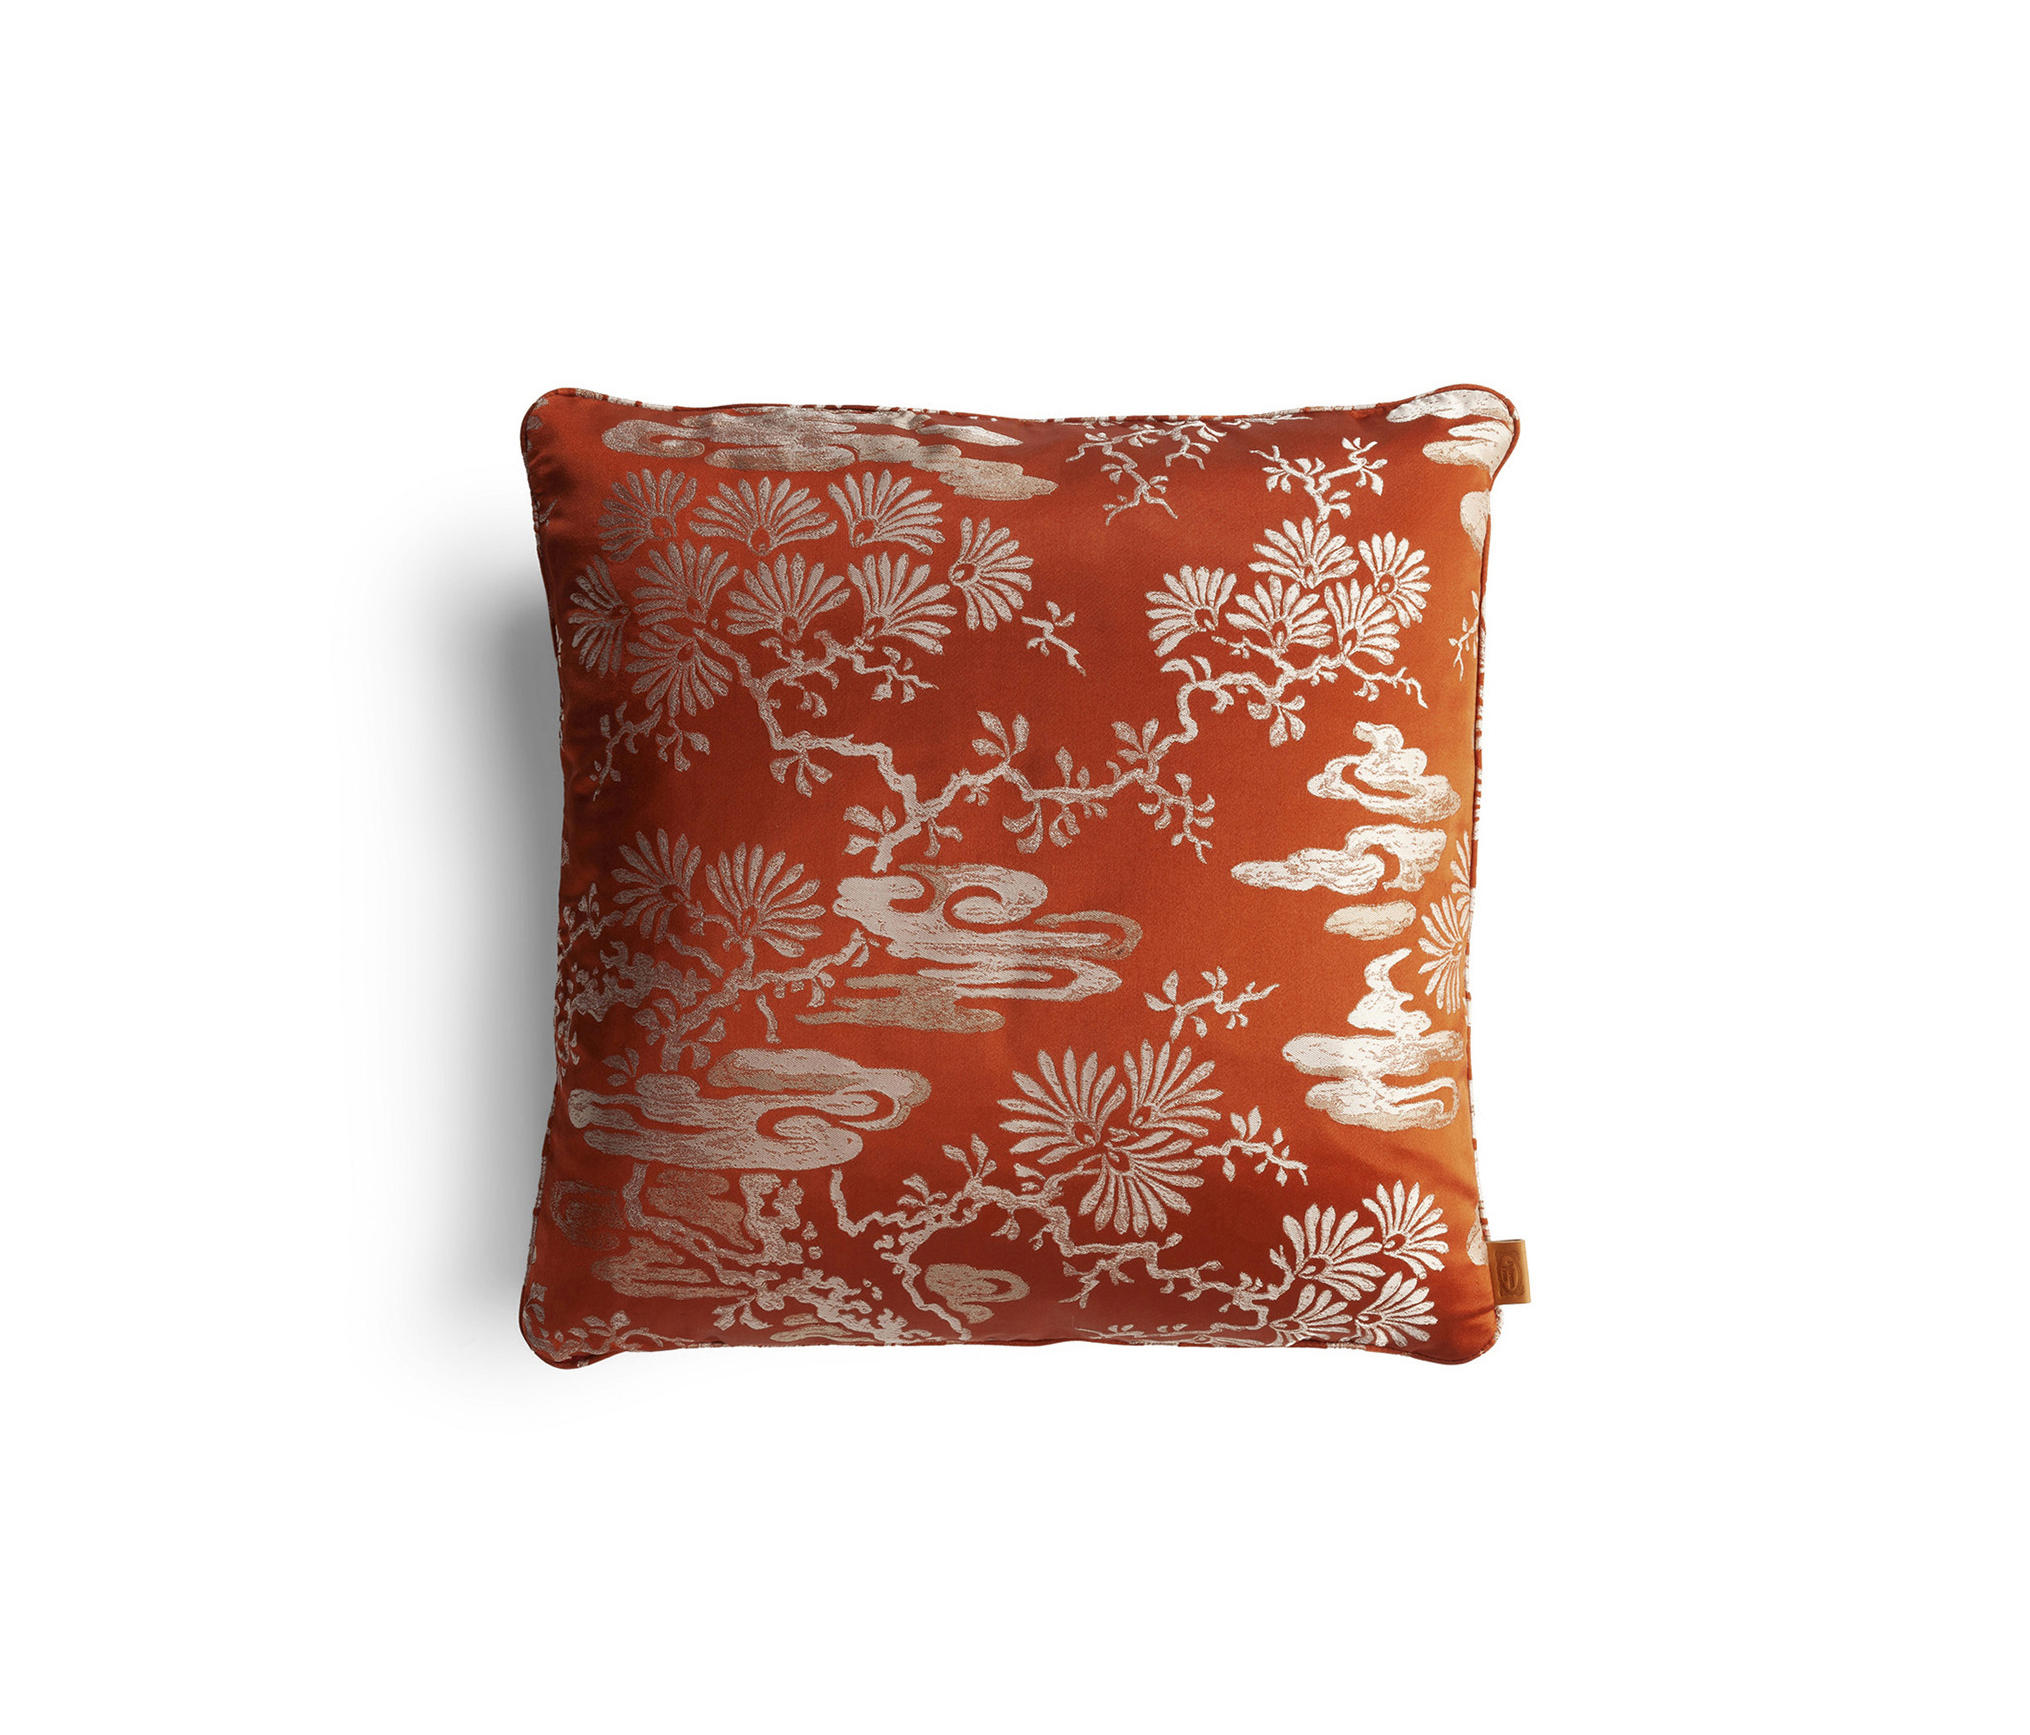 Pillow Poltrona Frau.Decorative Pillows Cushions From Poltrona Frau Architonic